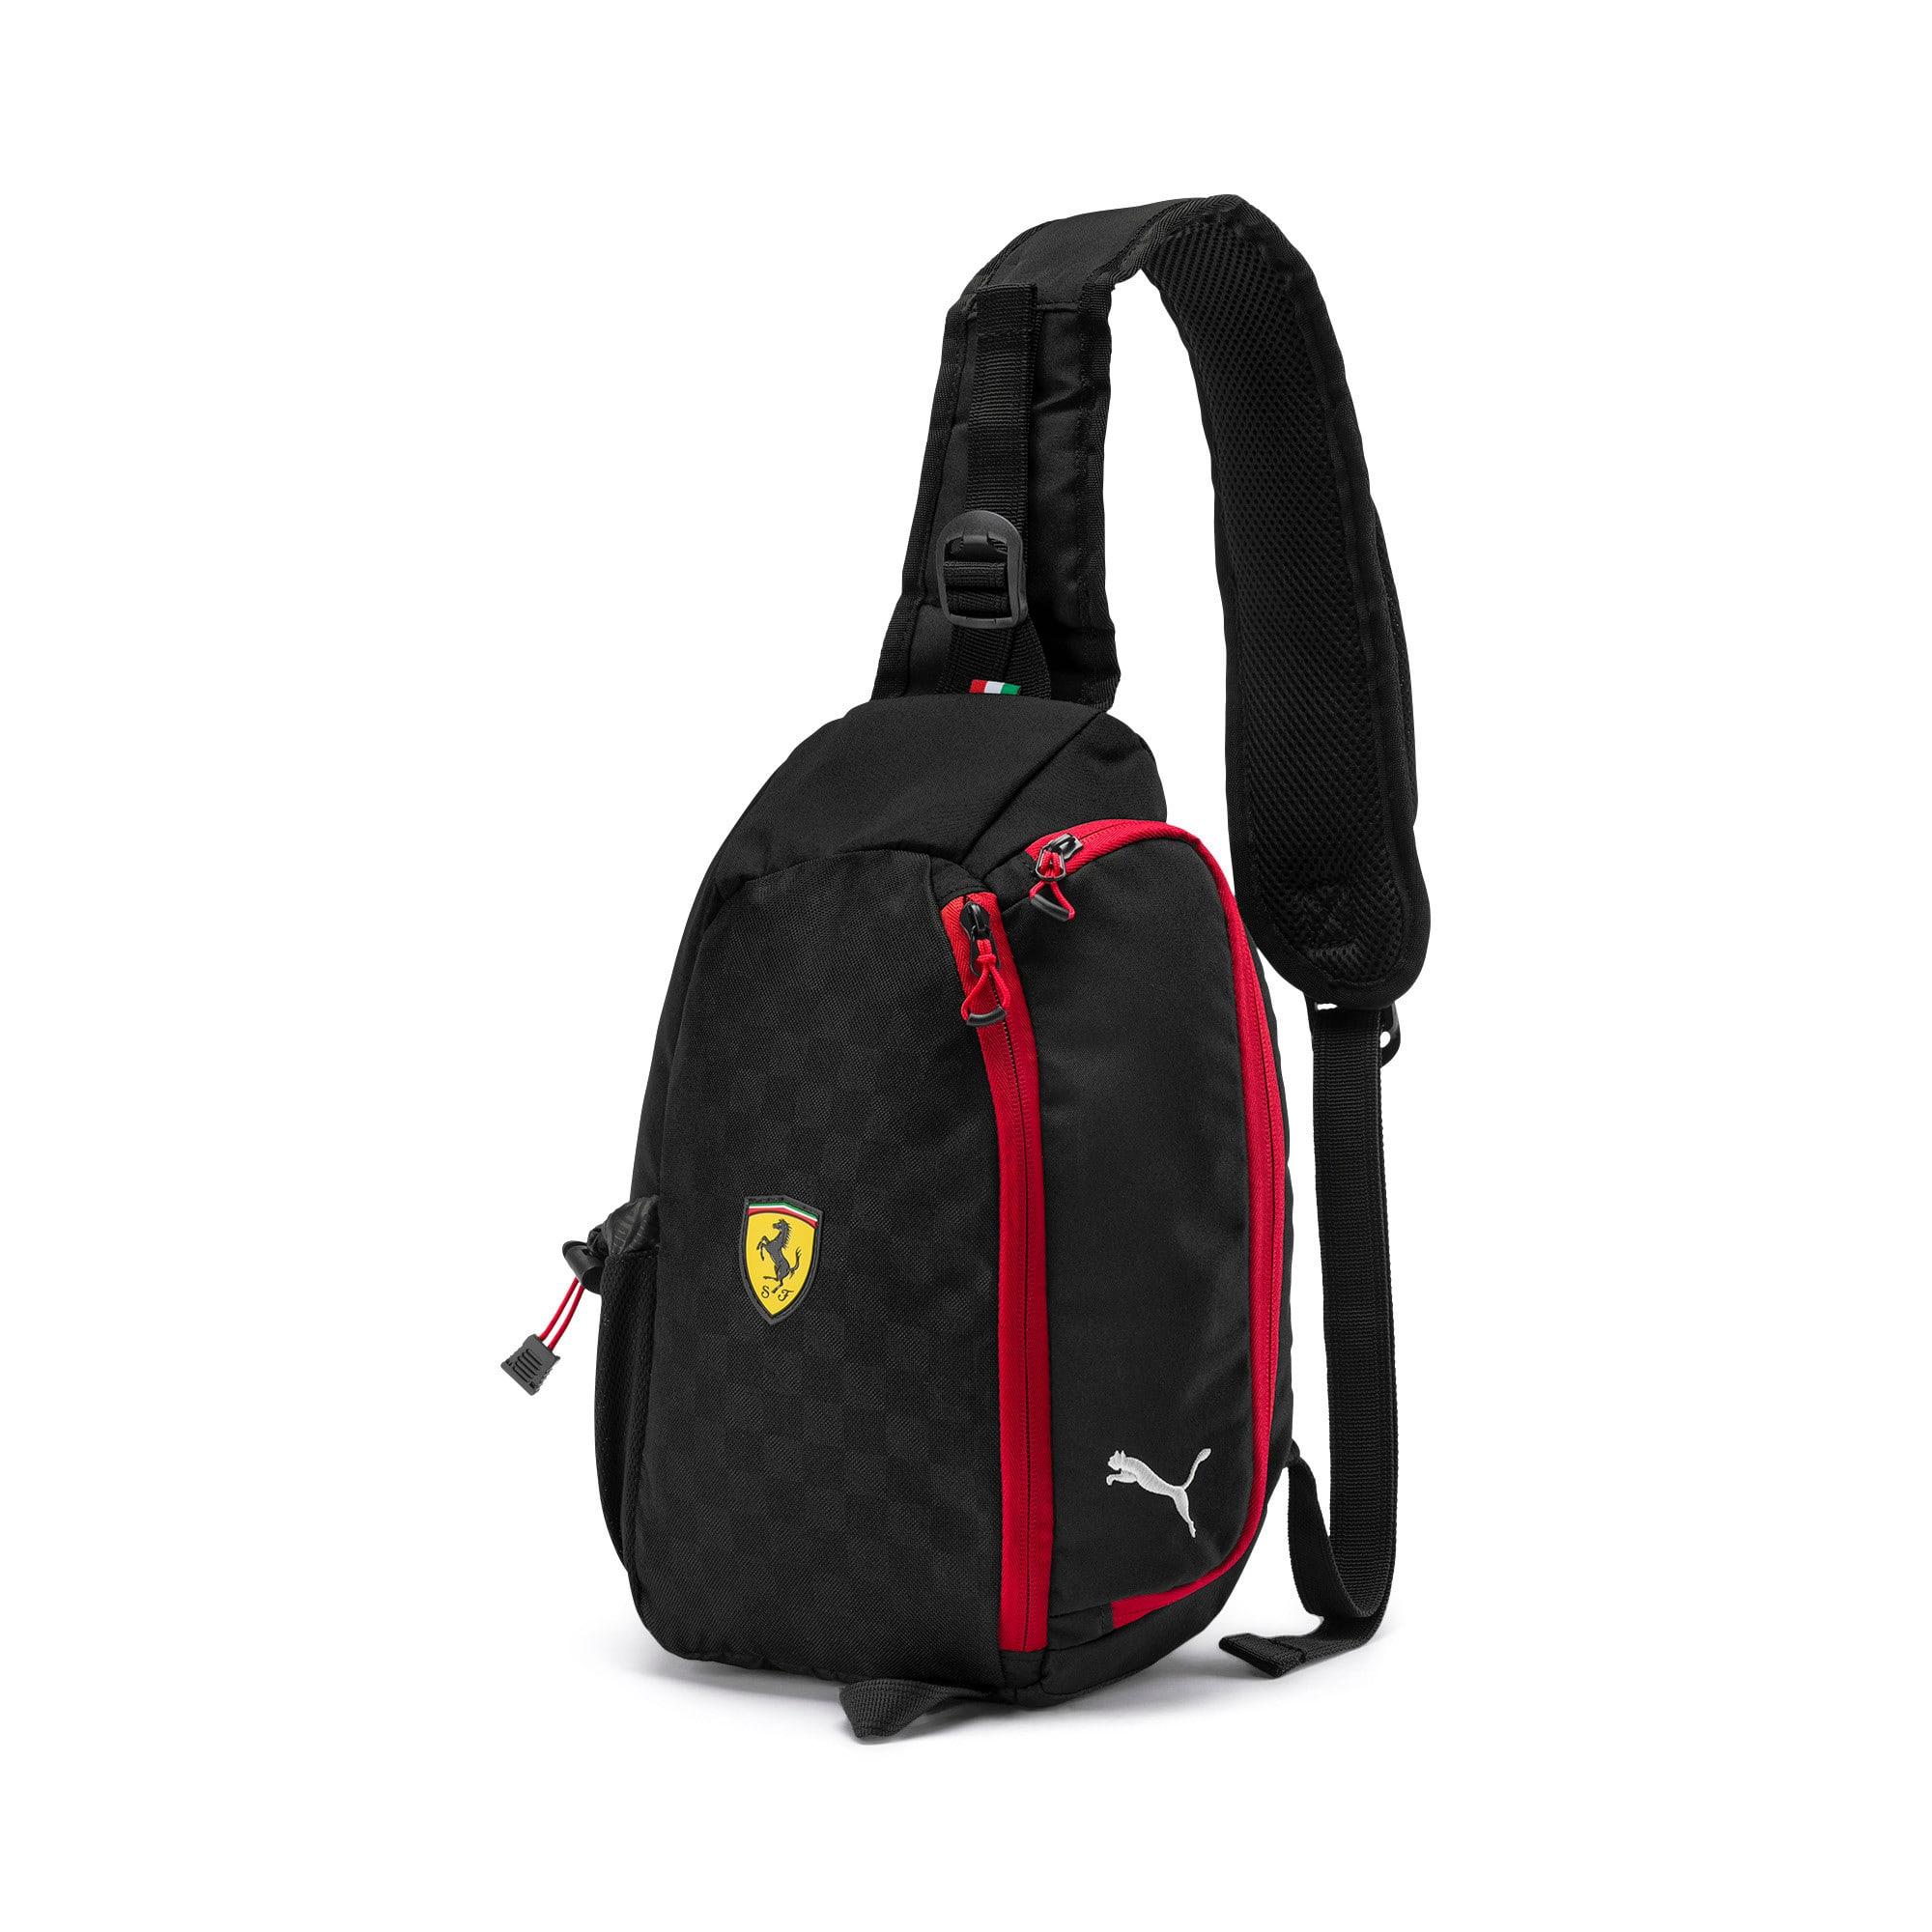 Thumbnail 1 of フェラーリ ファンウェア シリング バッグ 7L, Puma Black-Rosso Corsa, medium-JPN